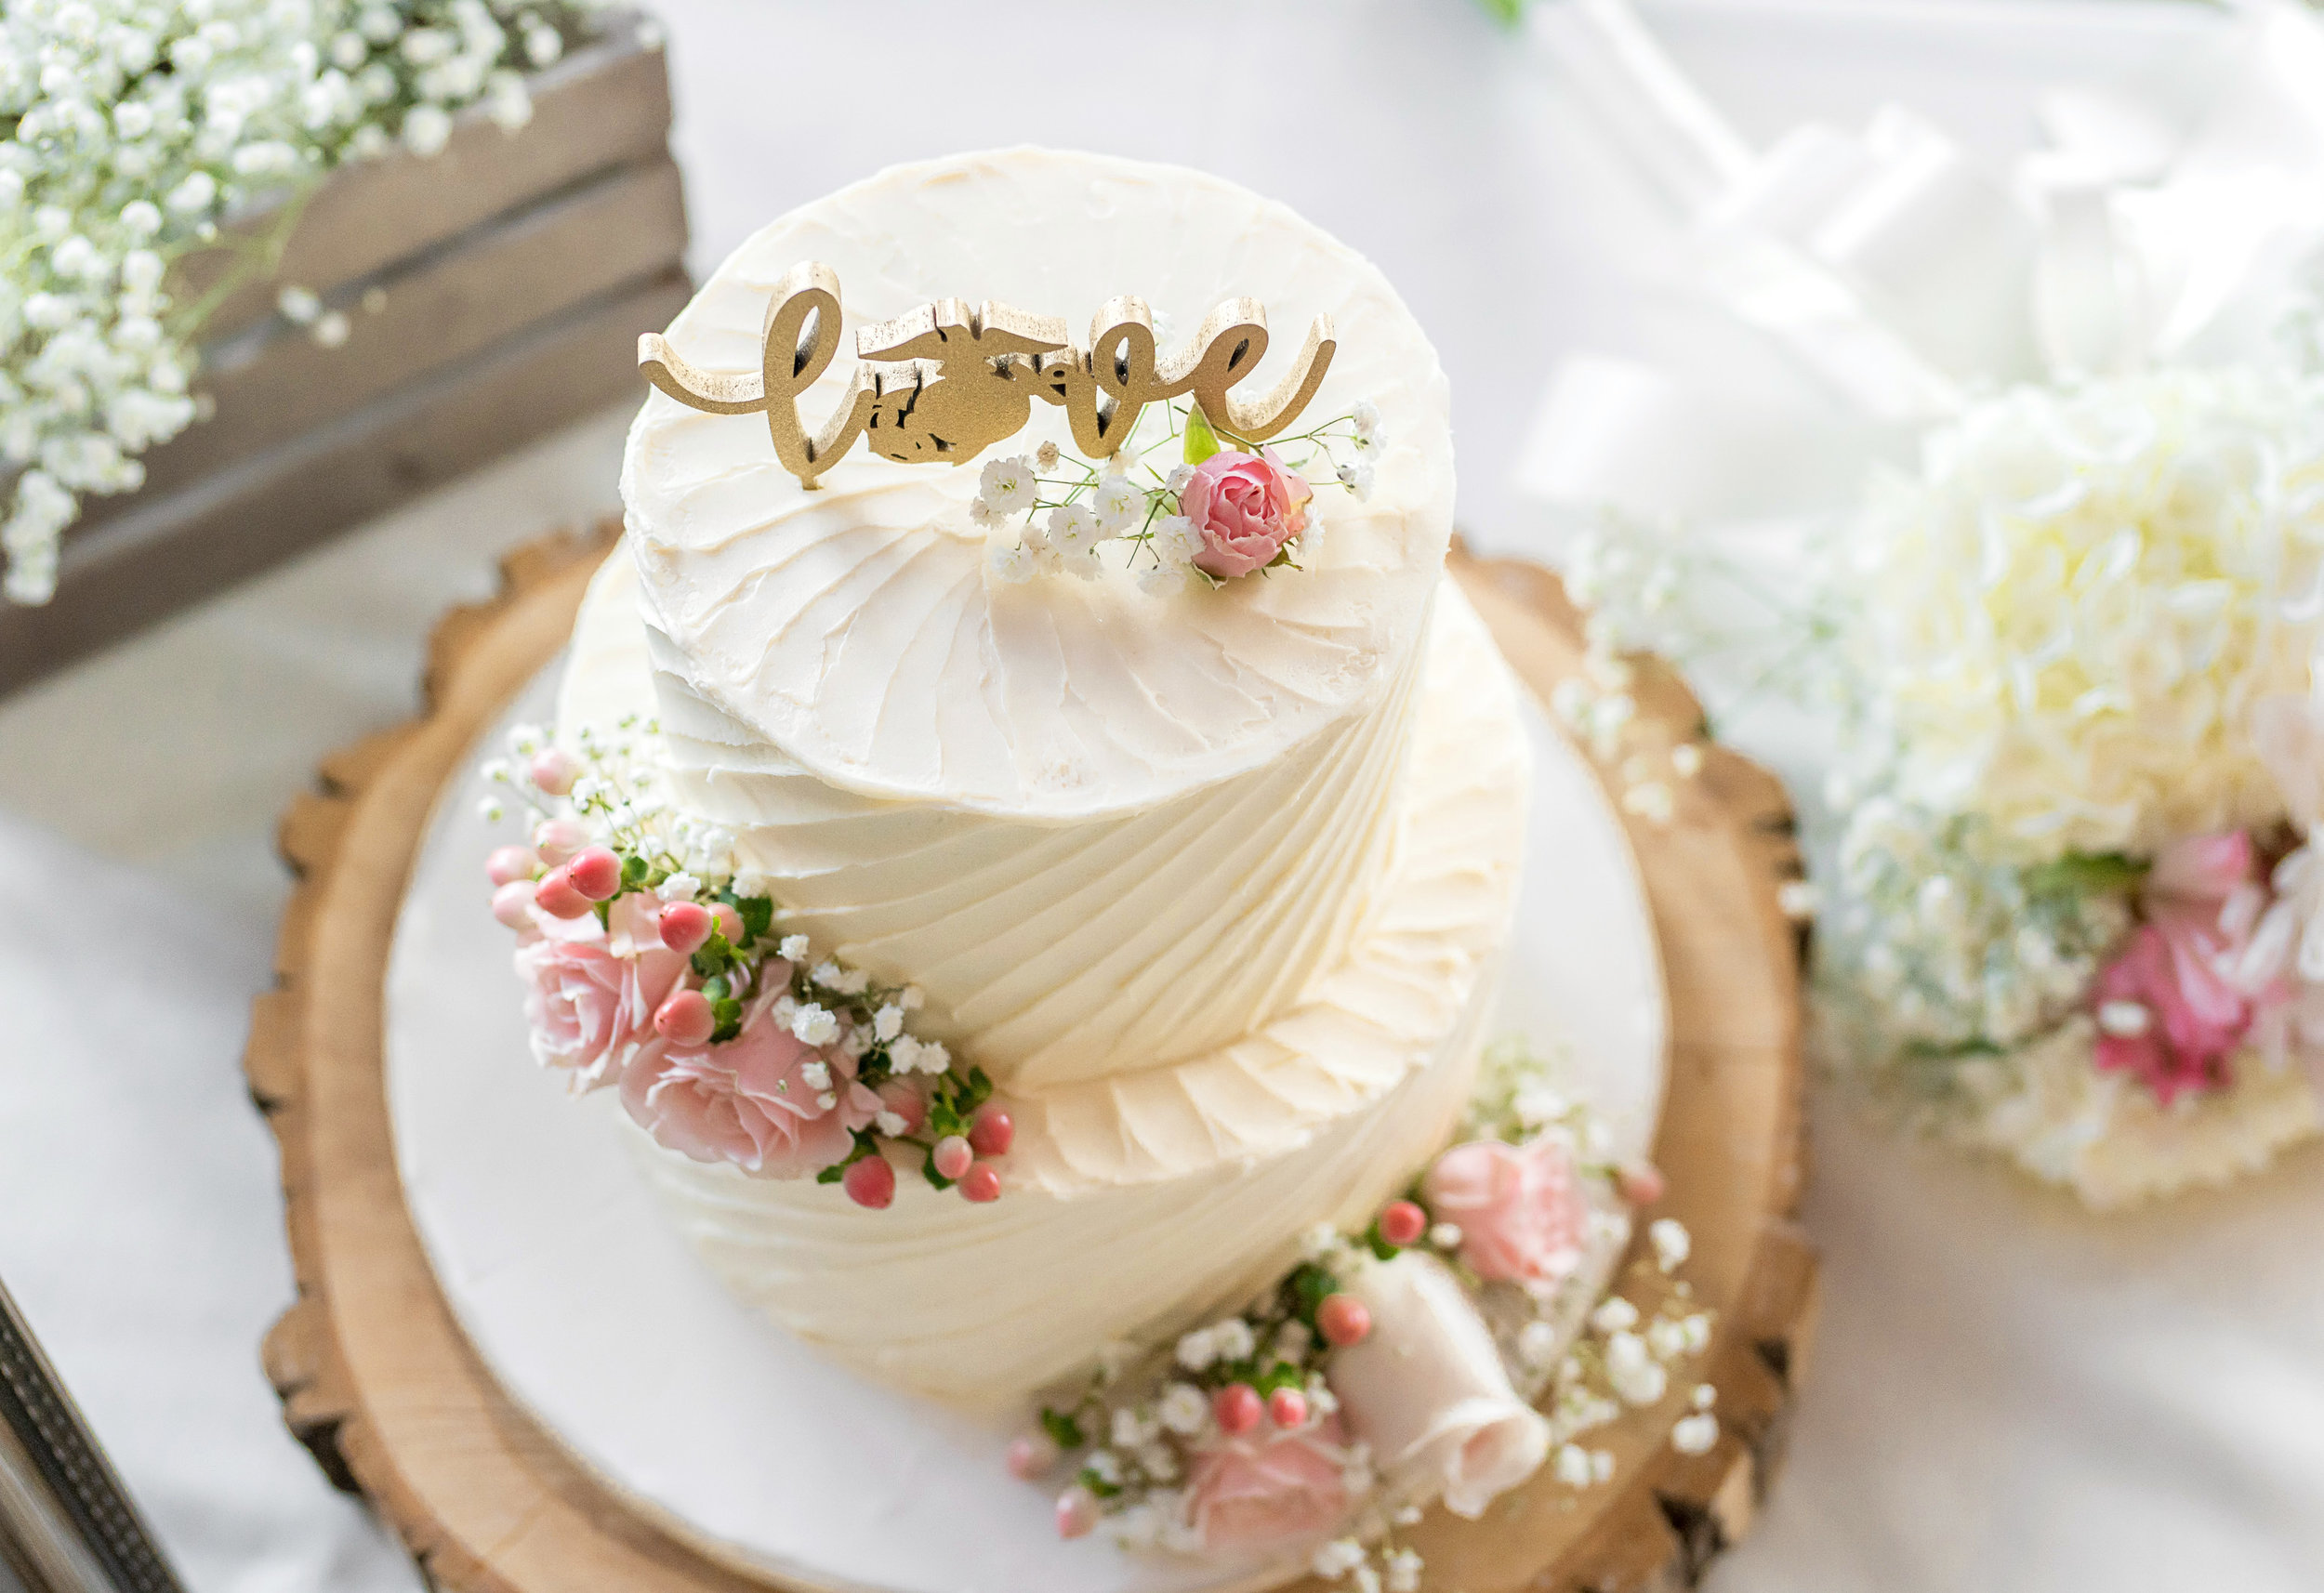 Beautiful classic white wedding cake by Gateau